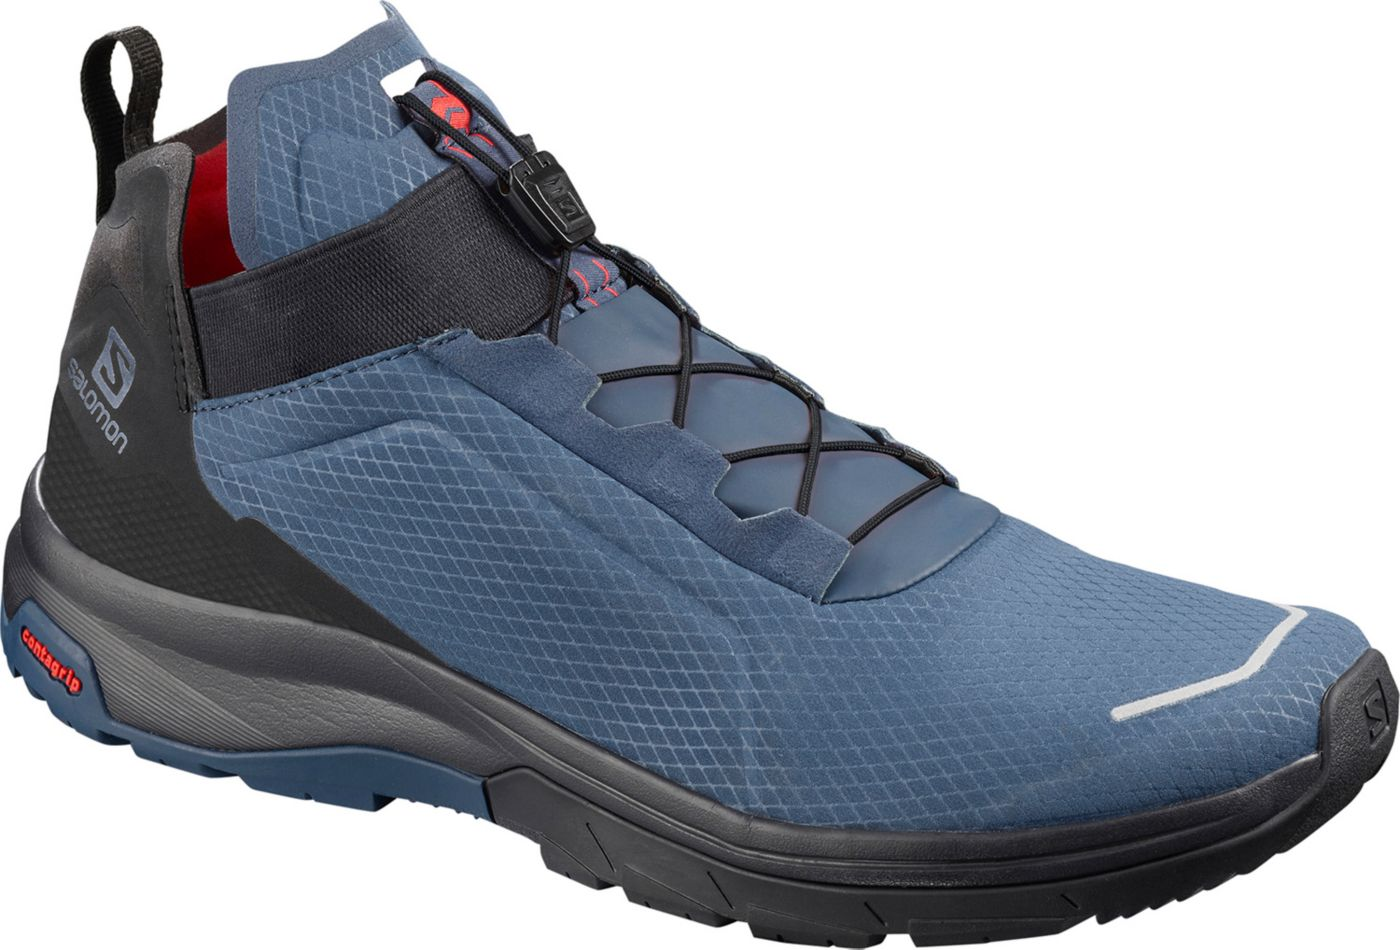 Salomon Men's T-Muter WR Hiking Boots